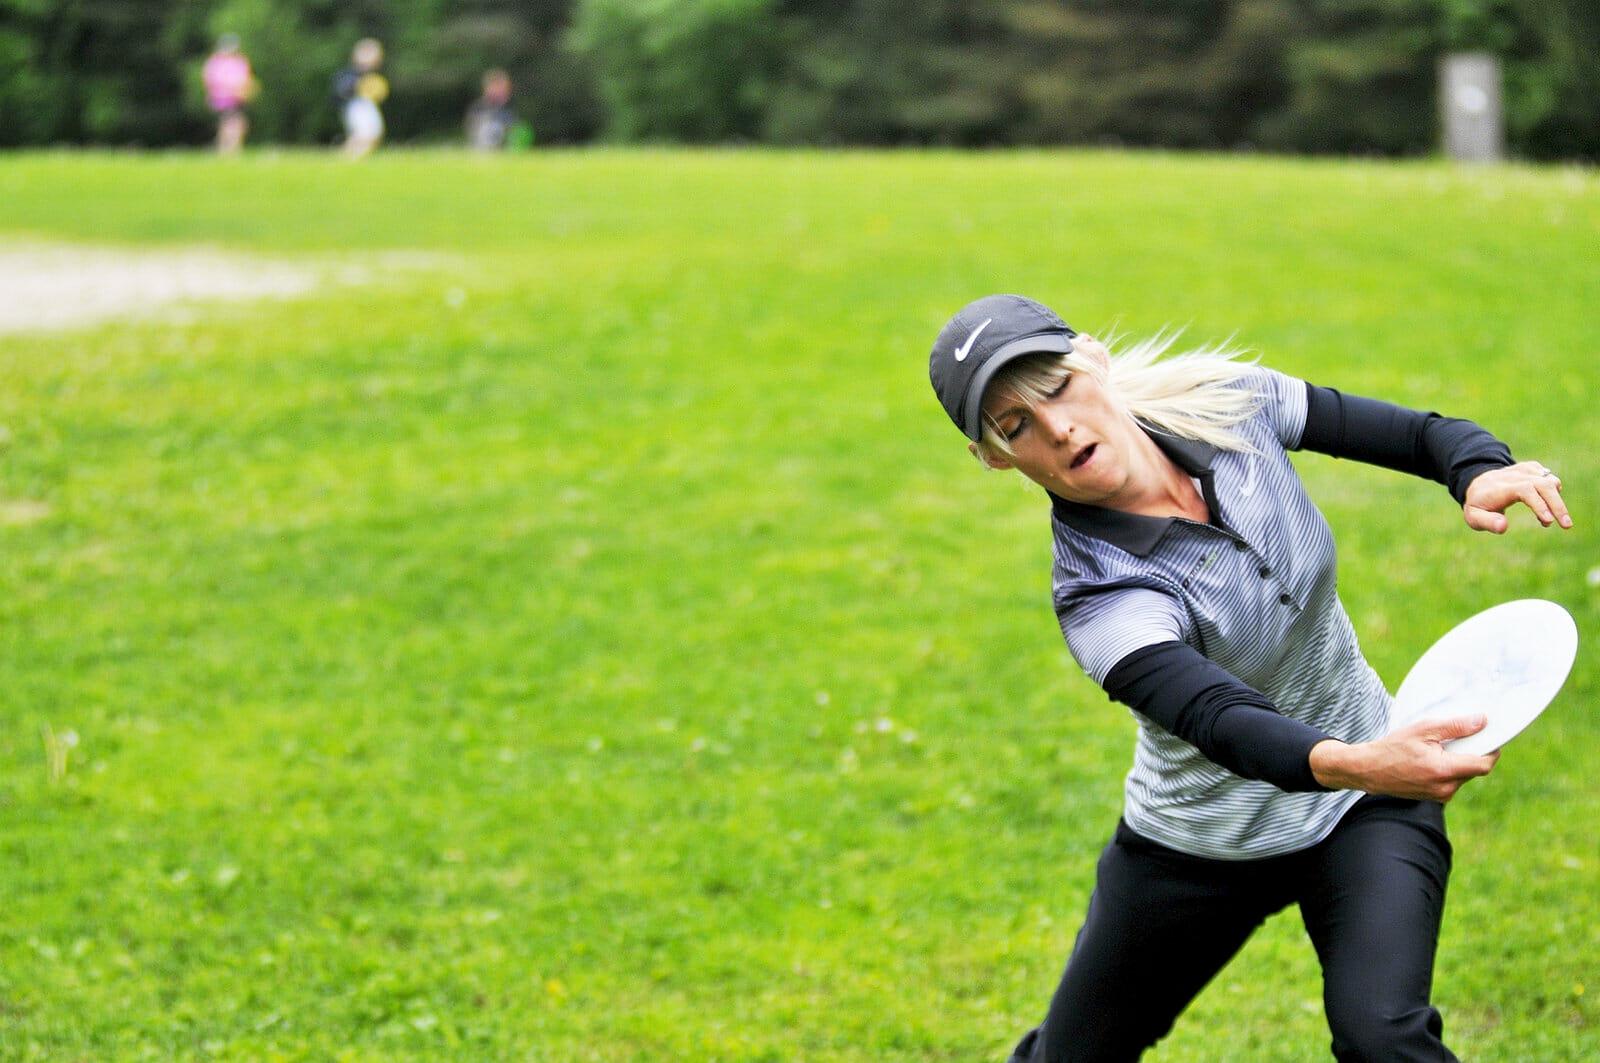 Catrina Allen drives at the Tali Open. Photo: Jarl Huotari, Tali Open